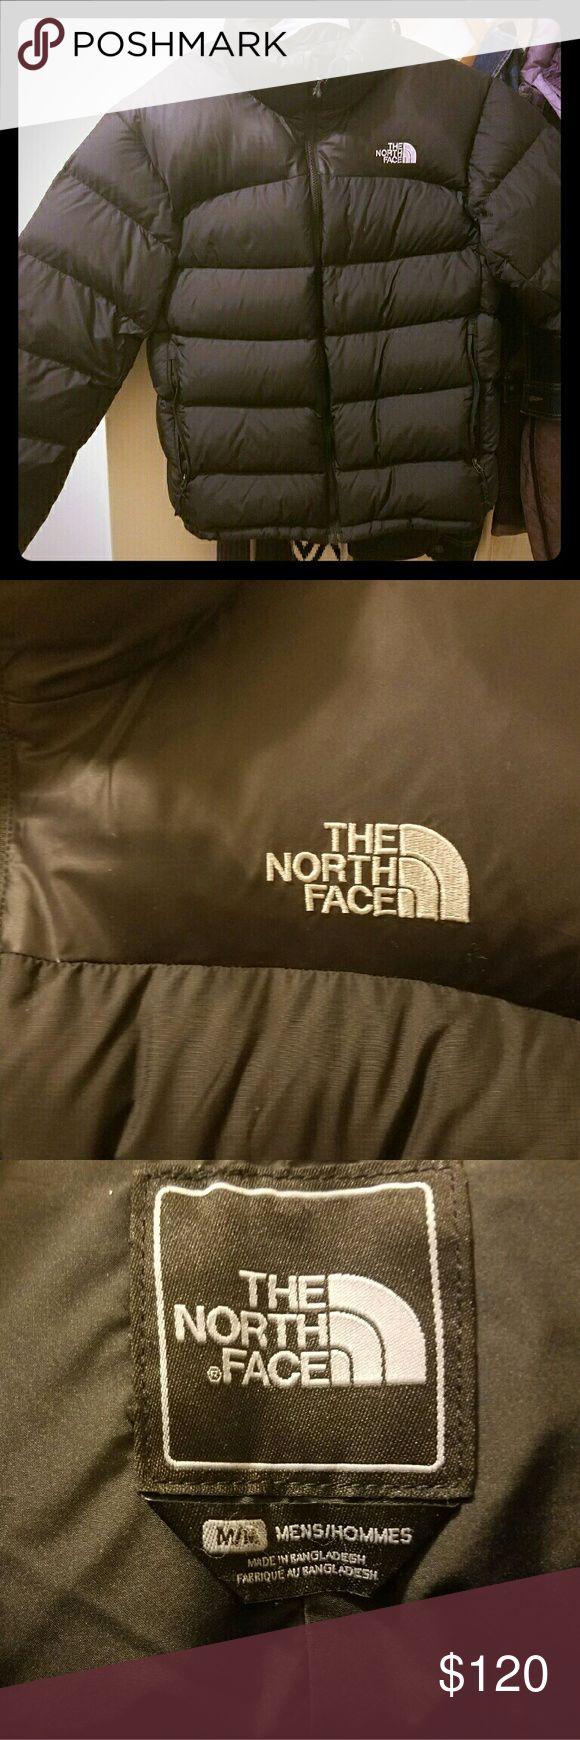 The North Face Nuptse Jacket MEN'S North Face Winter Jacket, Black The North Face Jackets & Coats Puffers